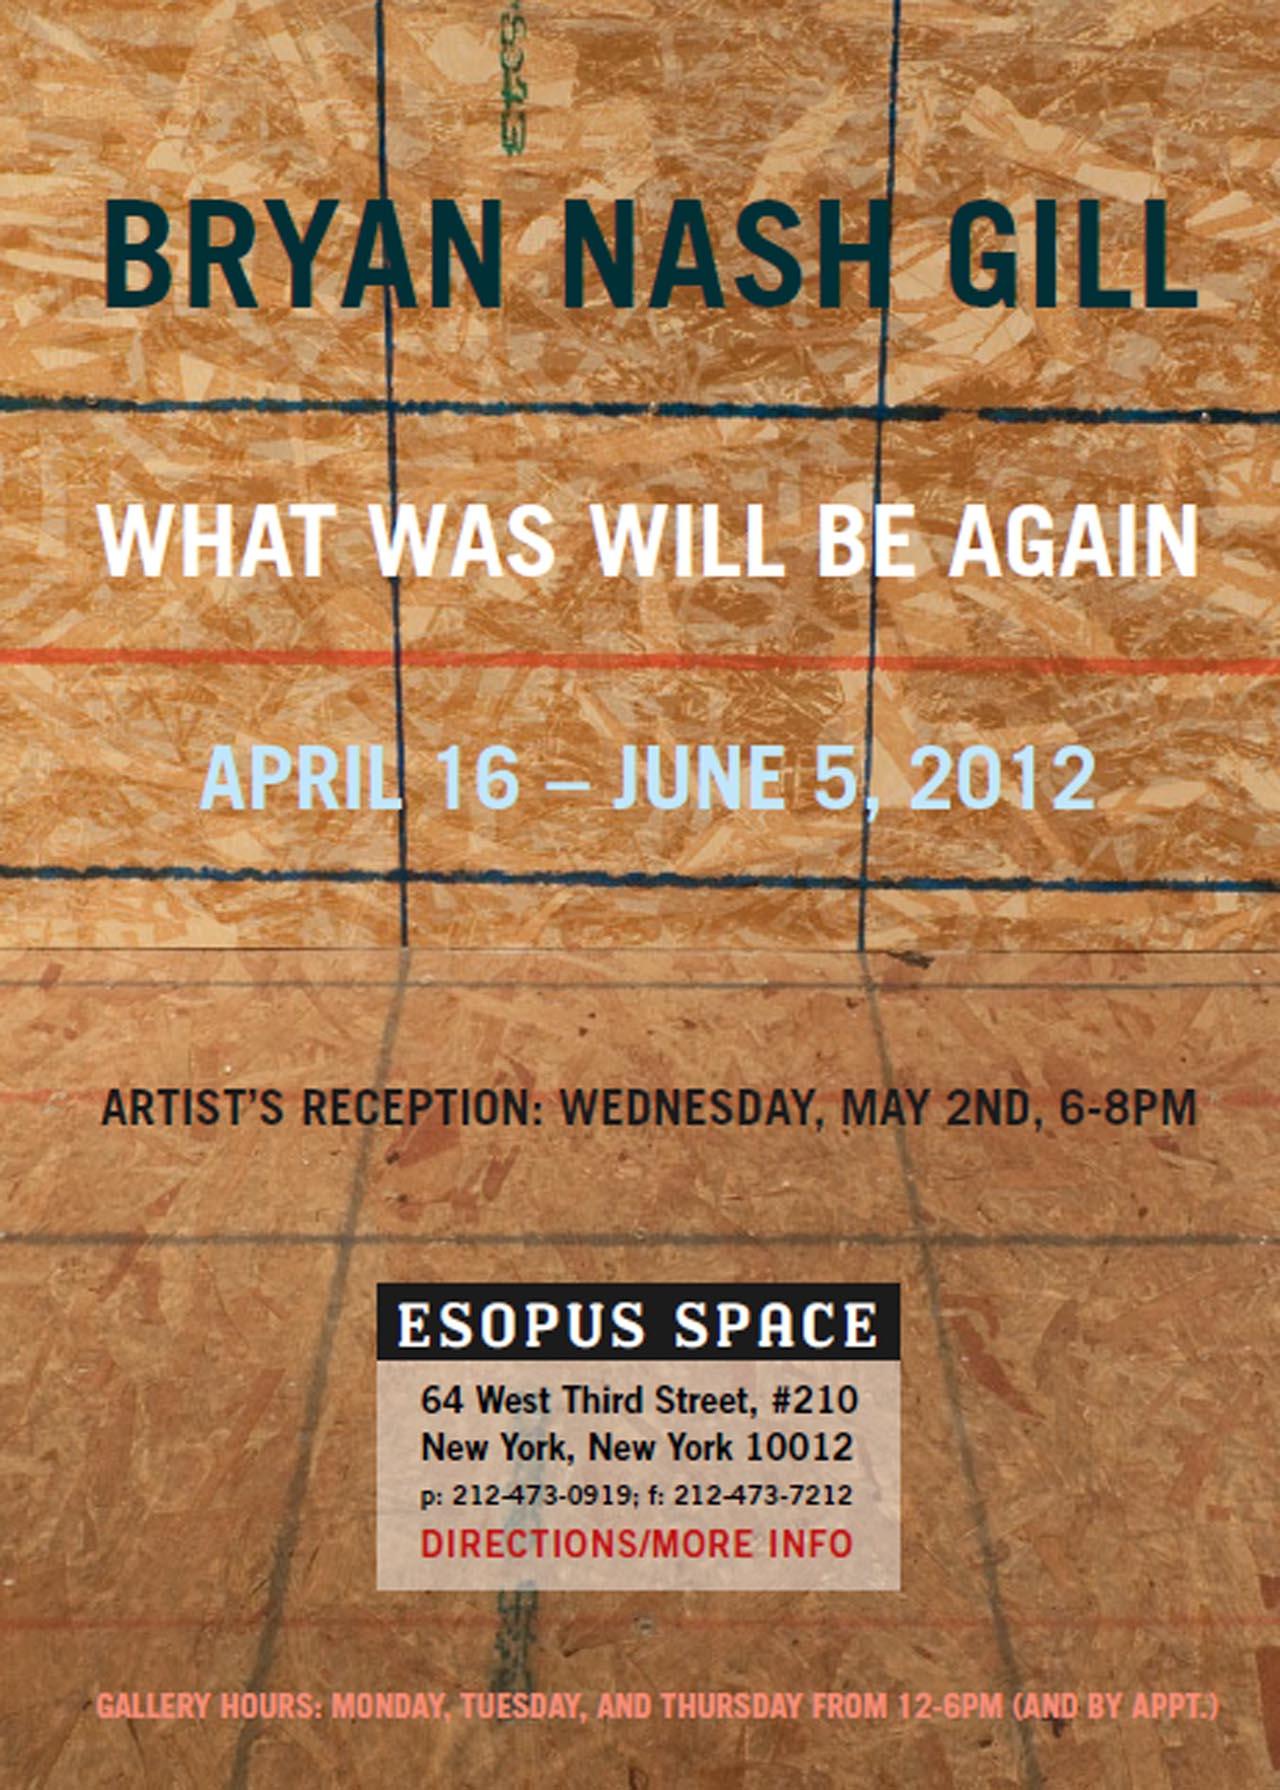 BRYAN_NASH_GILL_ESOPUS_SPACE.jpg